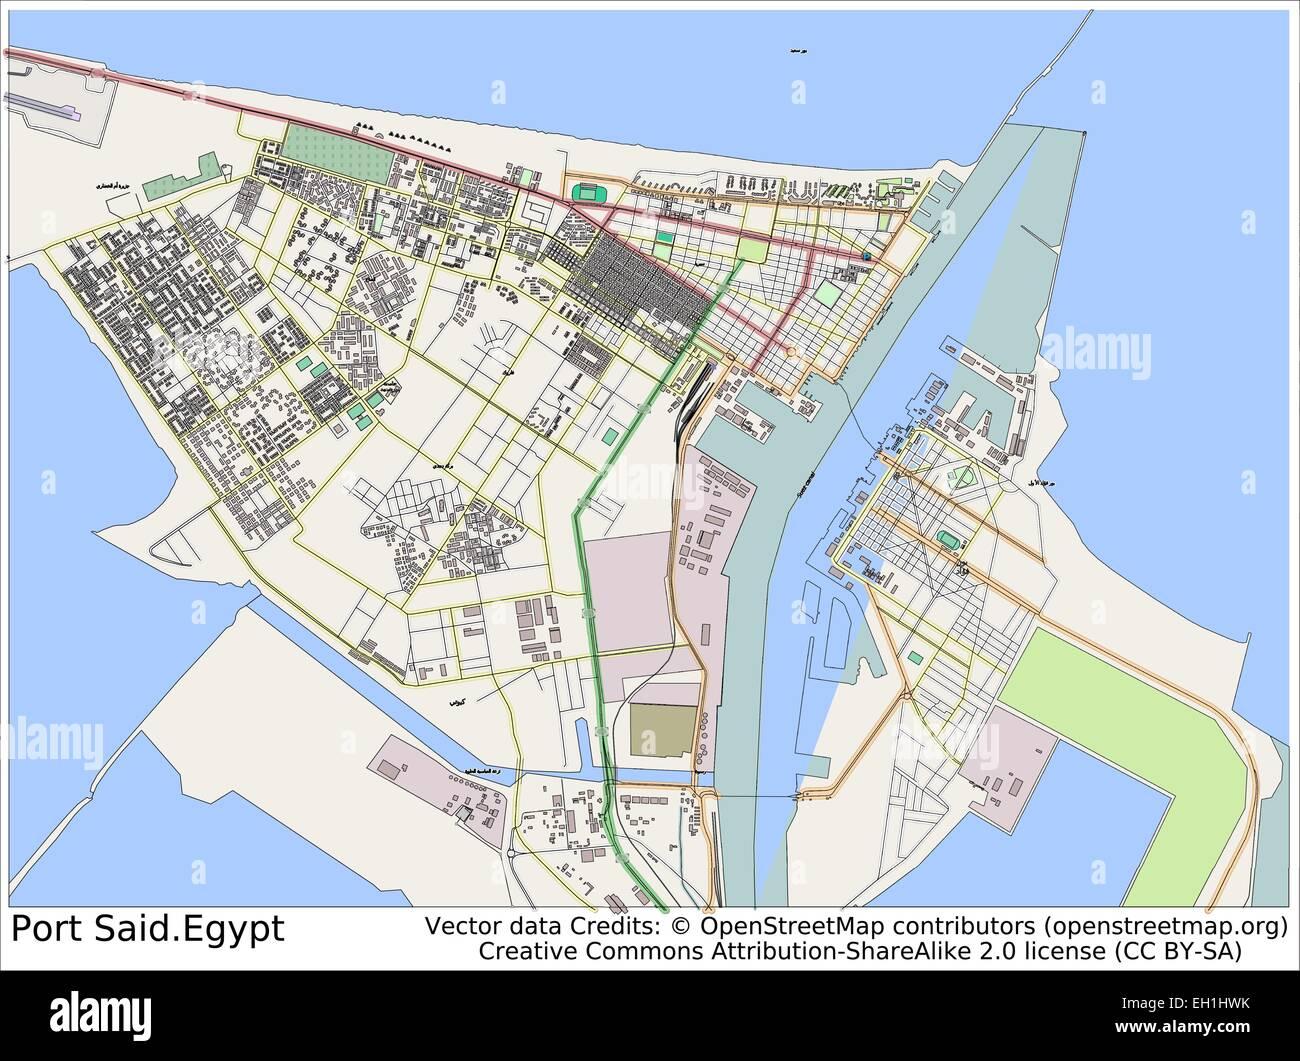 Port Said Egypt City Map Stock Vector Art Illustration Vector - Map of egypt ports